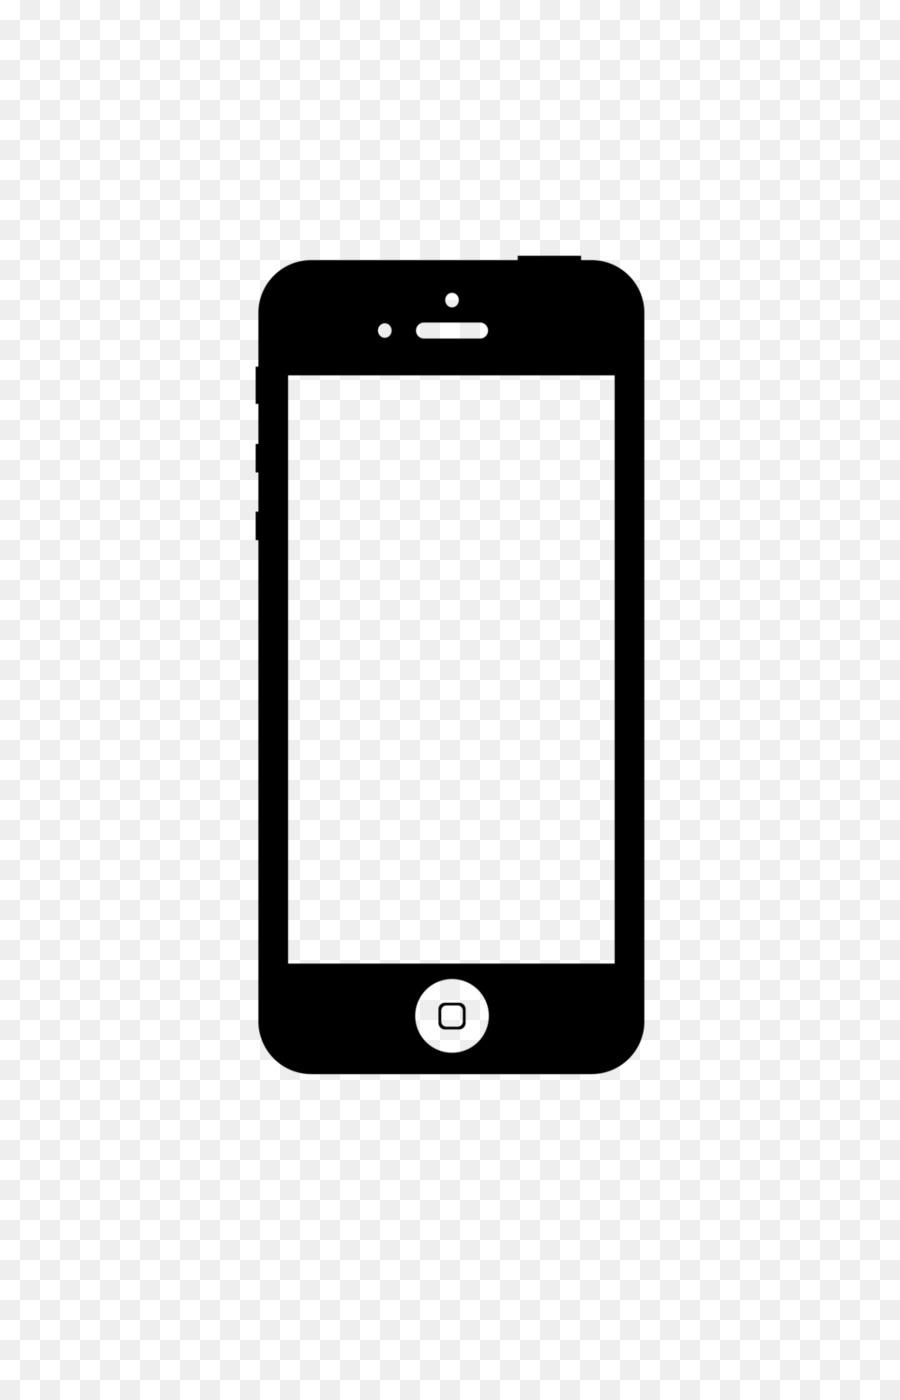 Phone Cartoon png download - 1000*1534 - Free Transparent